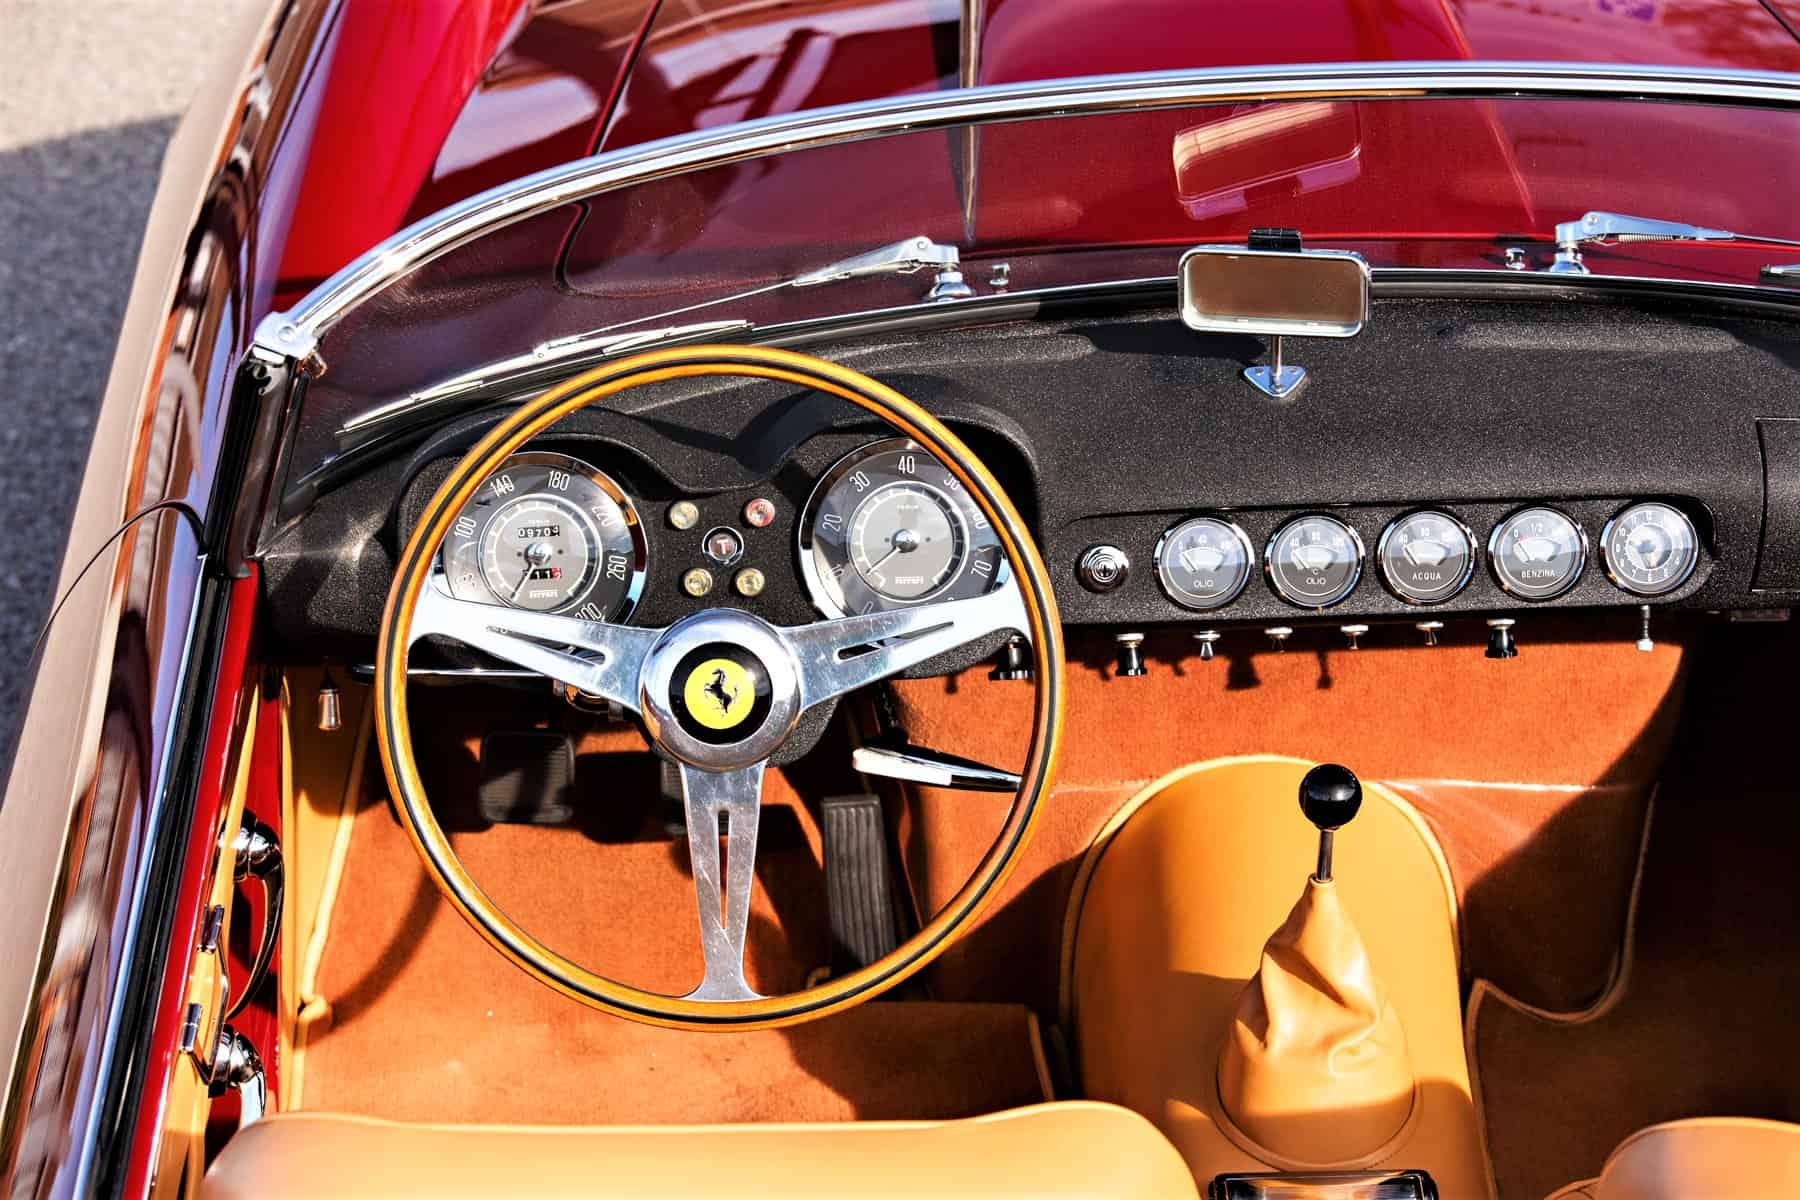 Ferrari, Gooding shows Amelia Island 'star car:' 1958 Ferrari California Spider, ClassicCars.com Journal